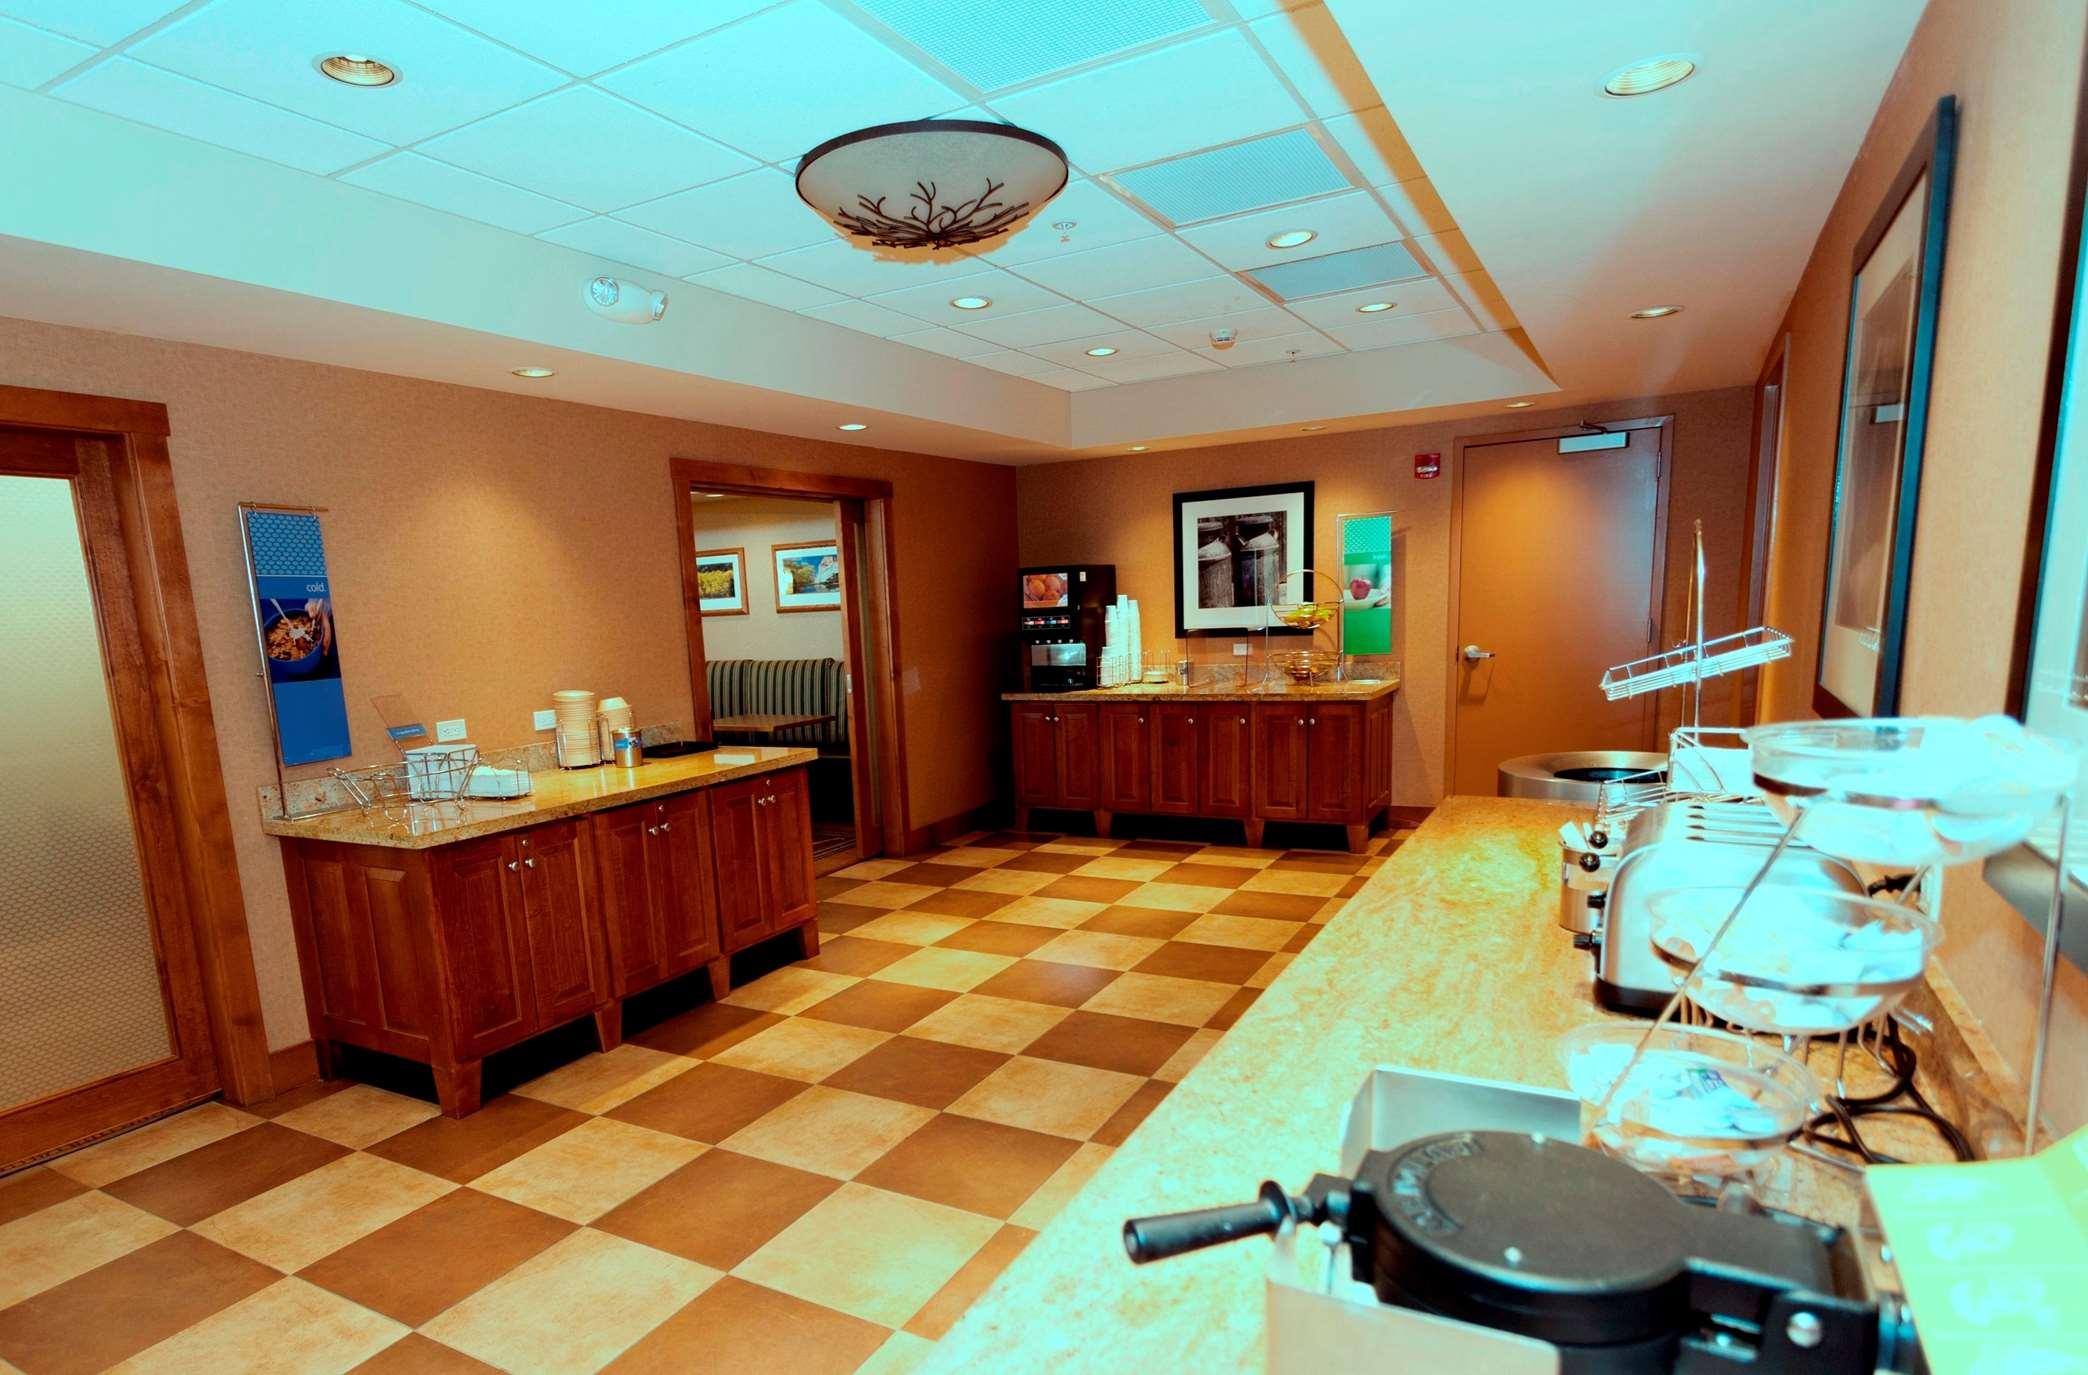 Hampton Inn & Suites Riverton image 30